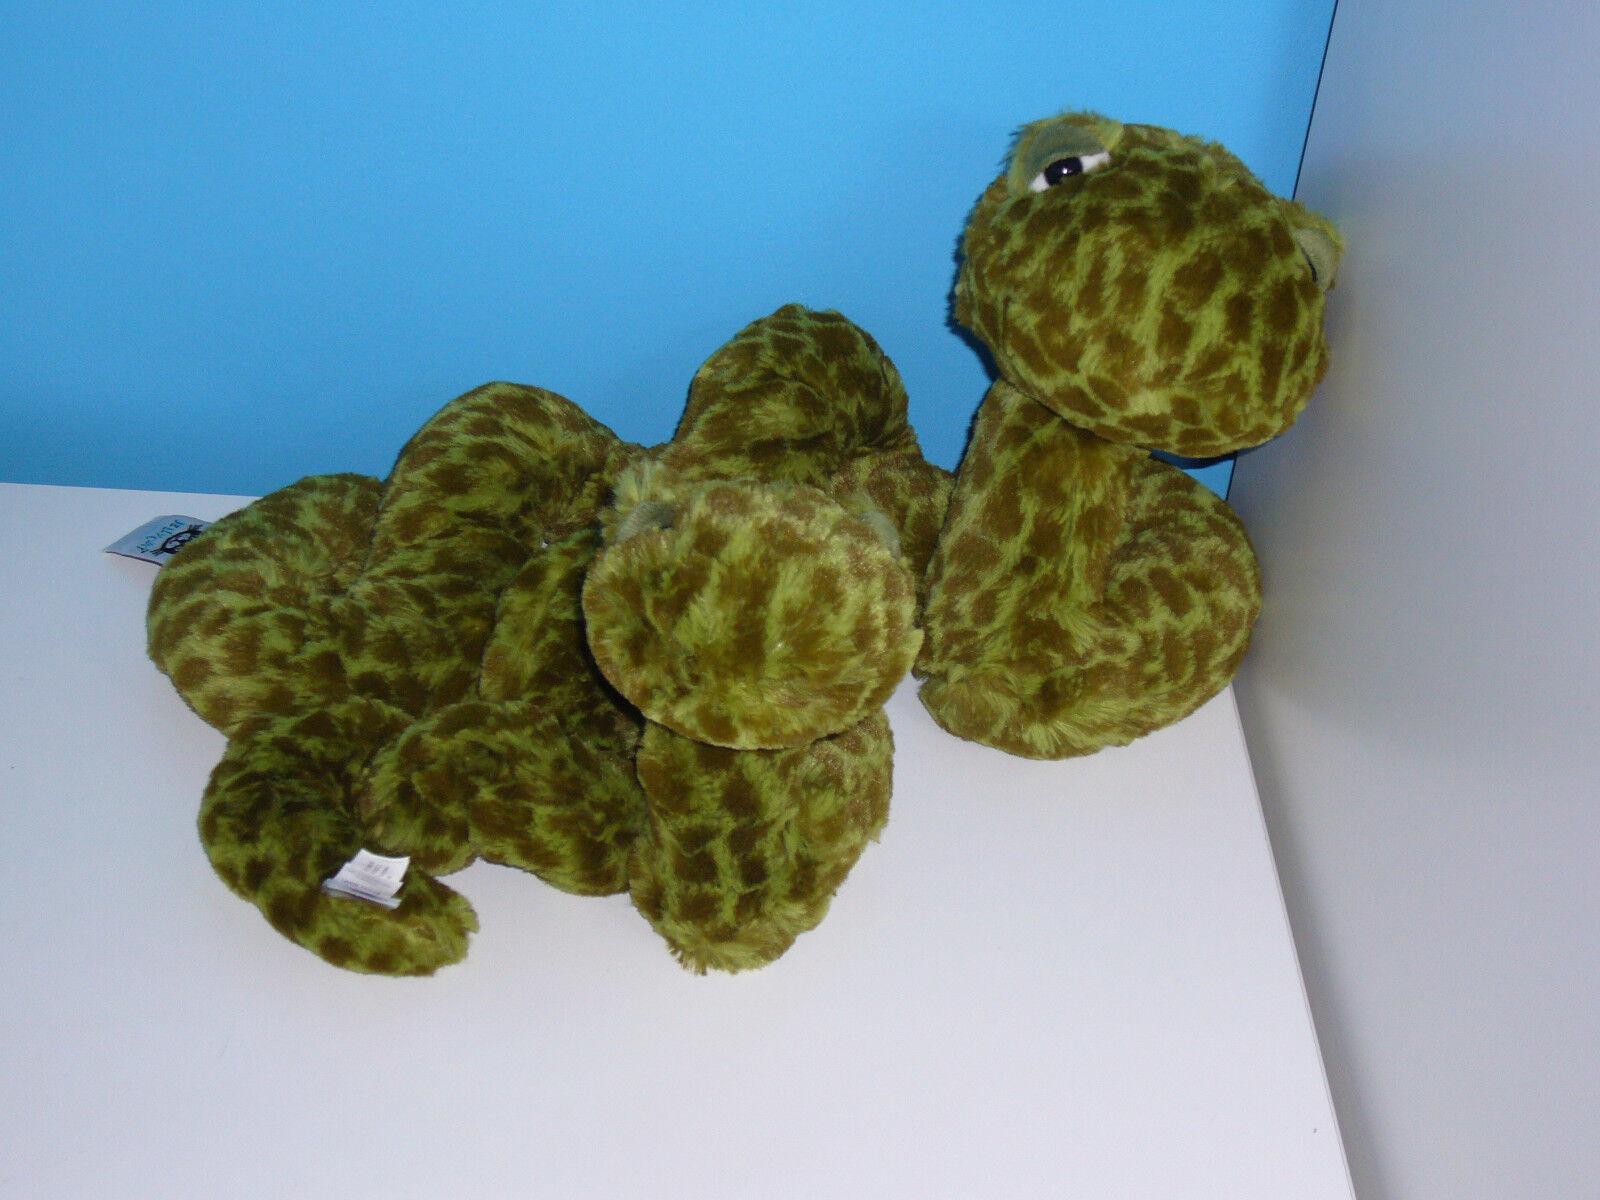 Set Collection of 2 Jellycat Sebastian Snakes Snake Soft Beanie Toys Green